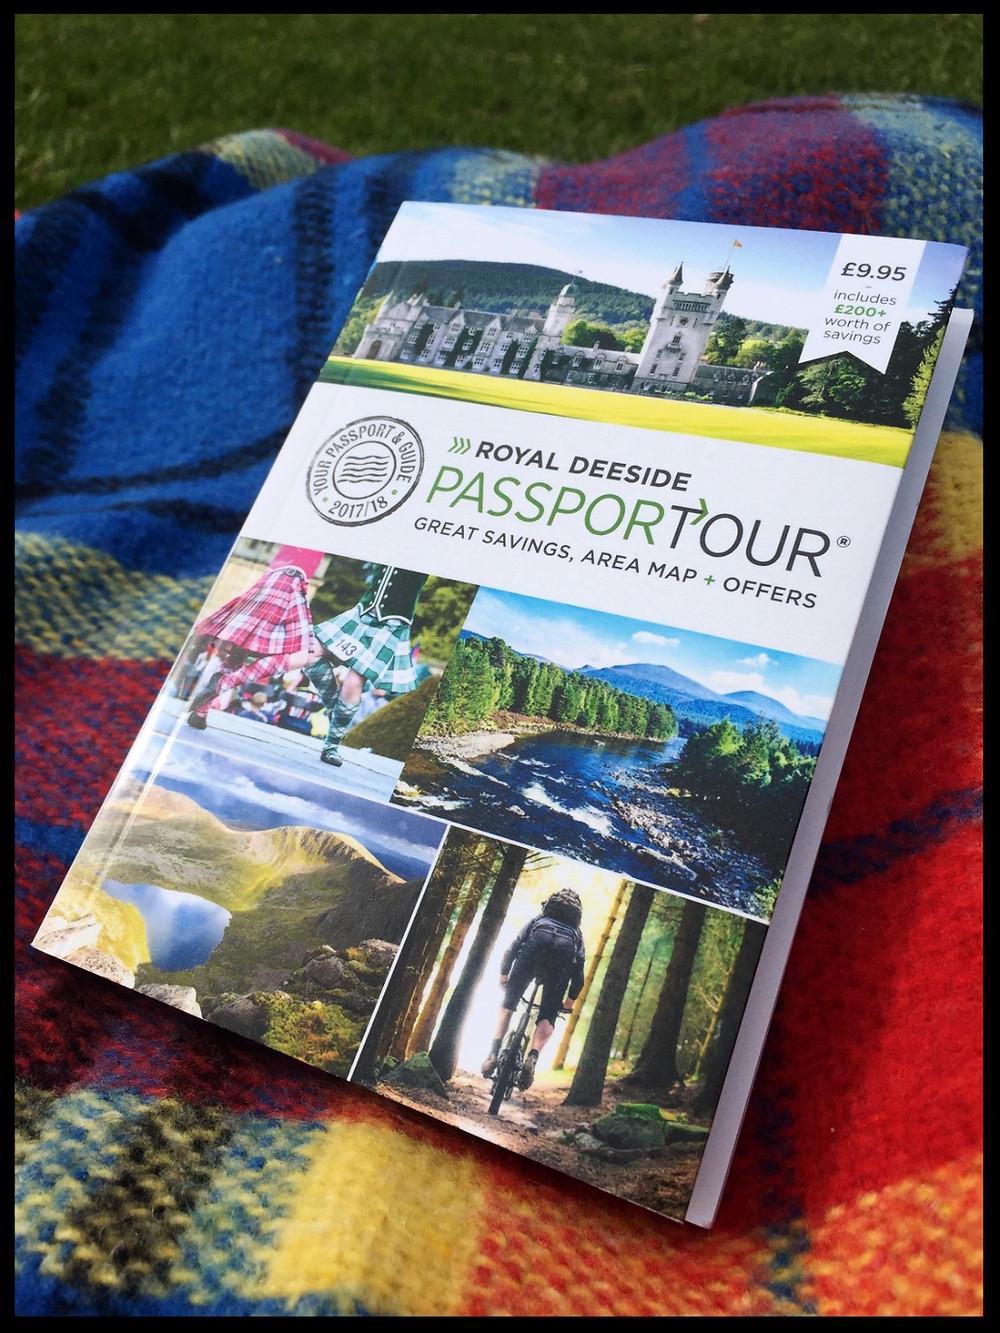 Royal Deeside PassporTour book